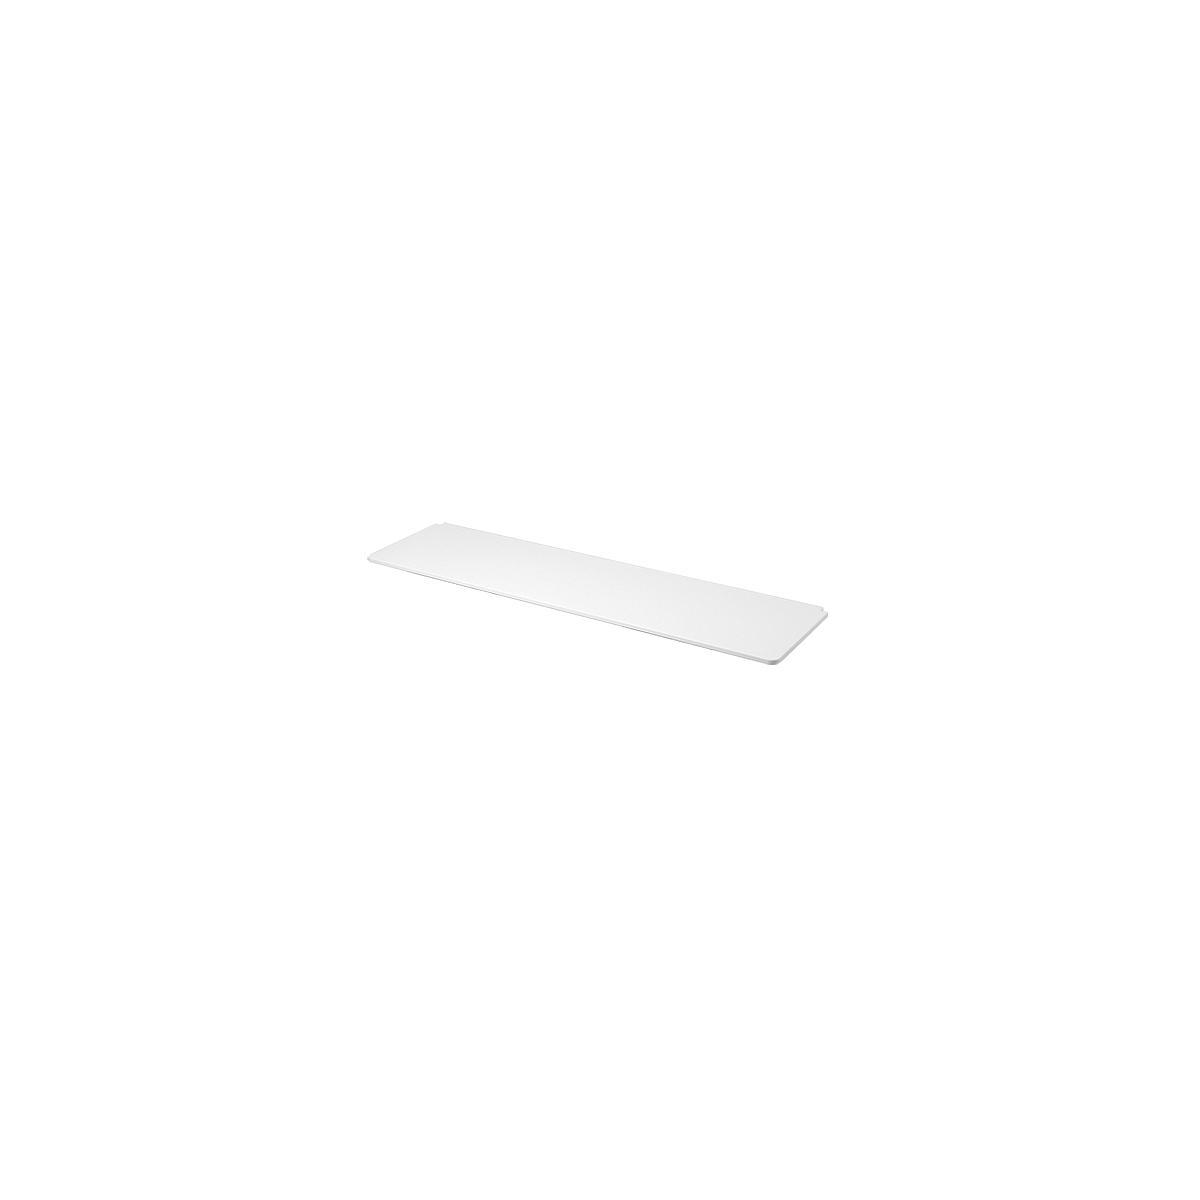 WHITE by Flexa Bureau pour lit mezzanine 90x190cm